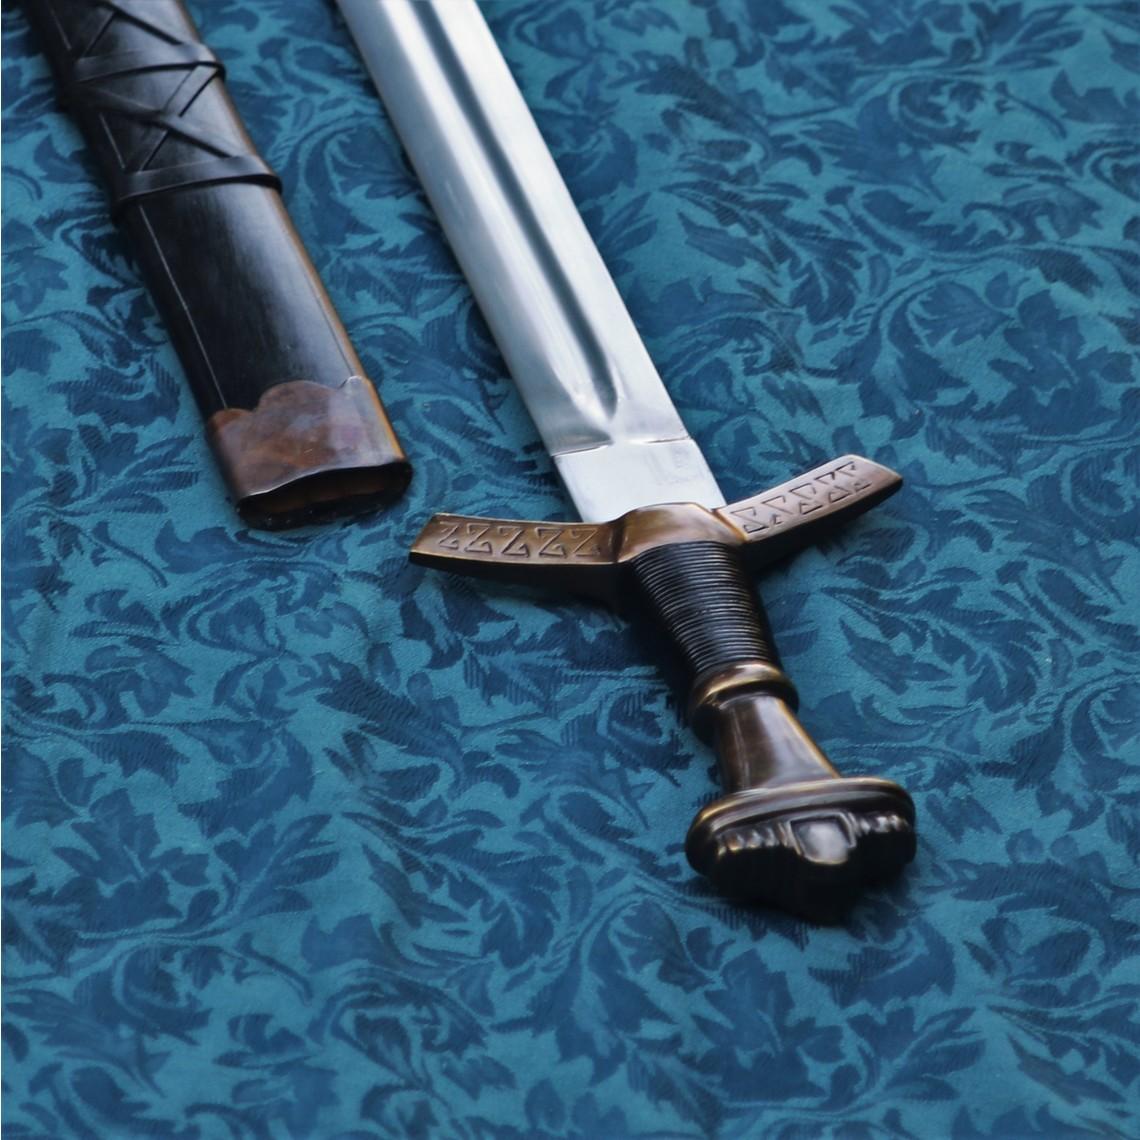 Windlass Steelcrafts Rey Arturo espada Excalibur